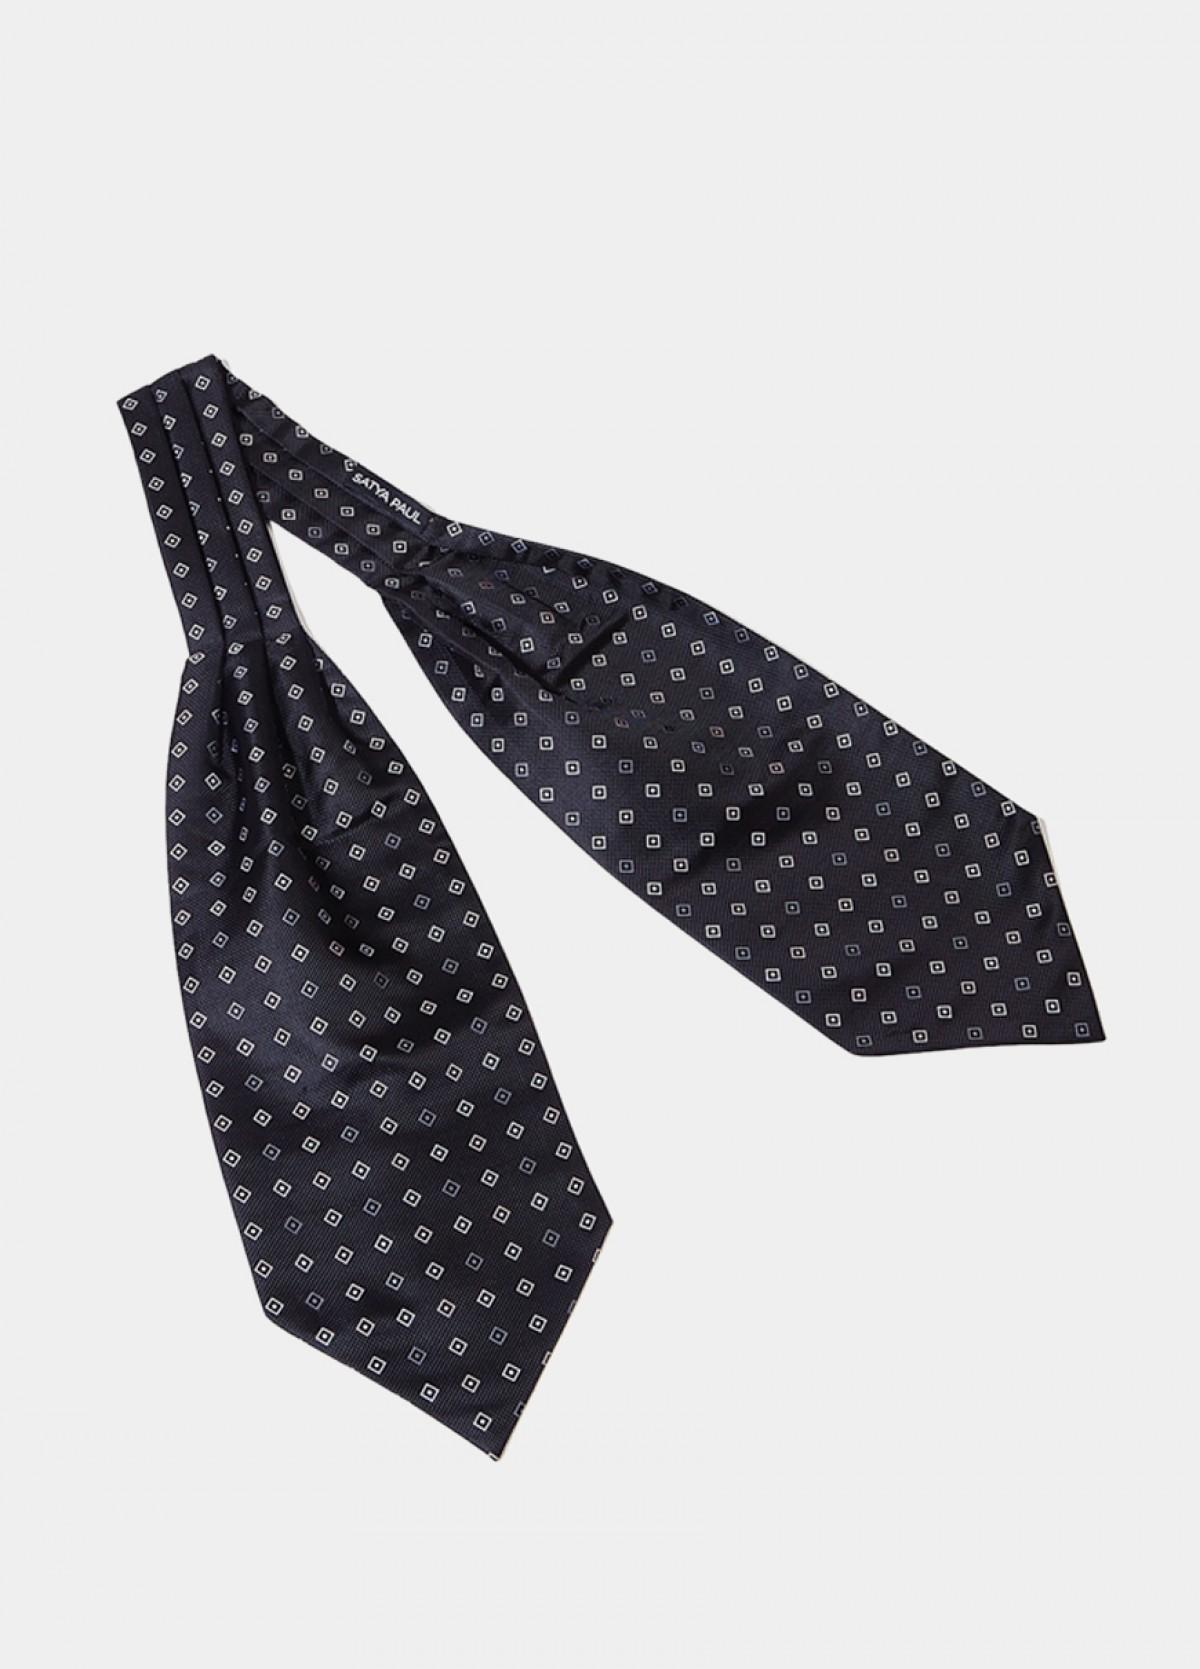 The Black Cravat